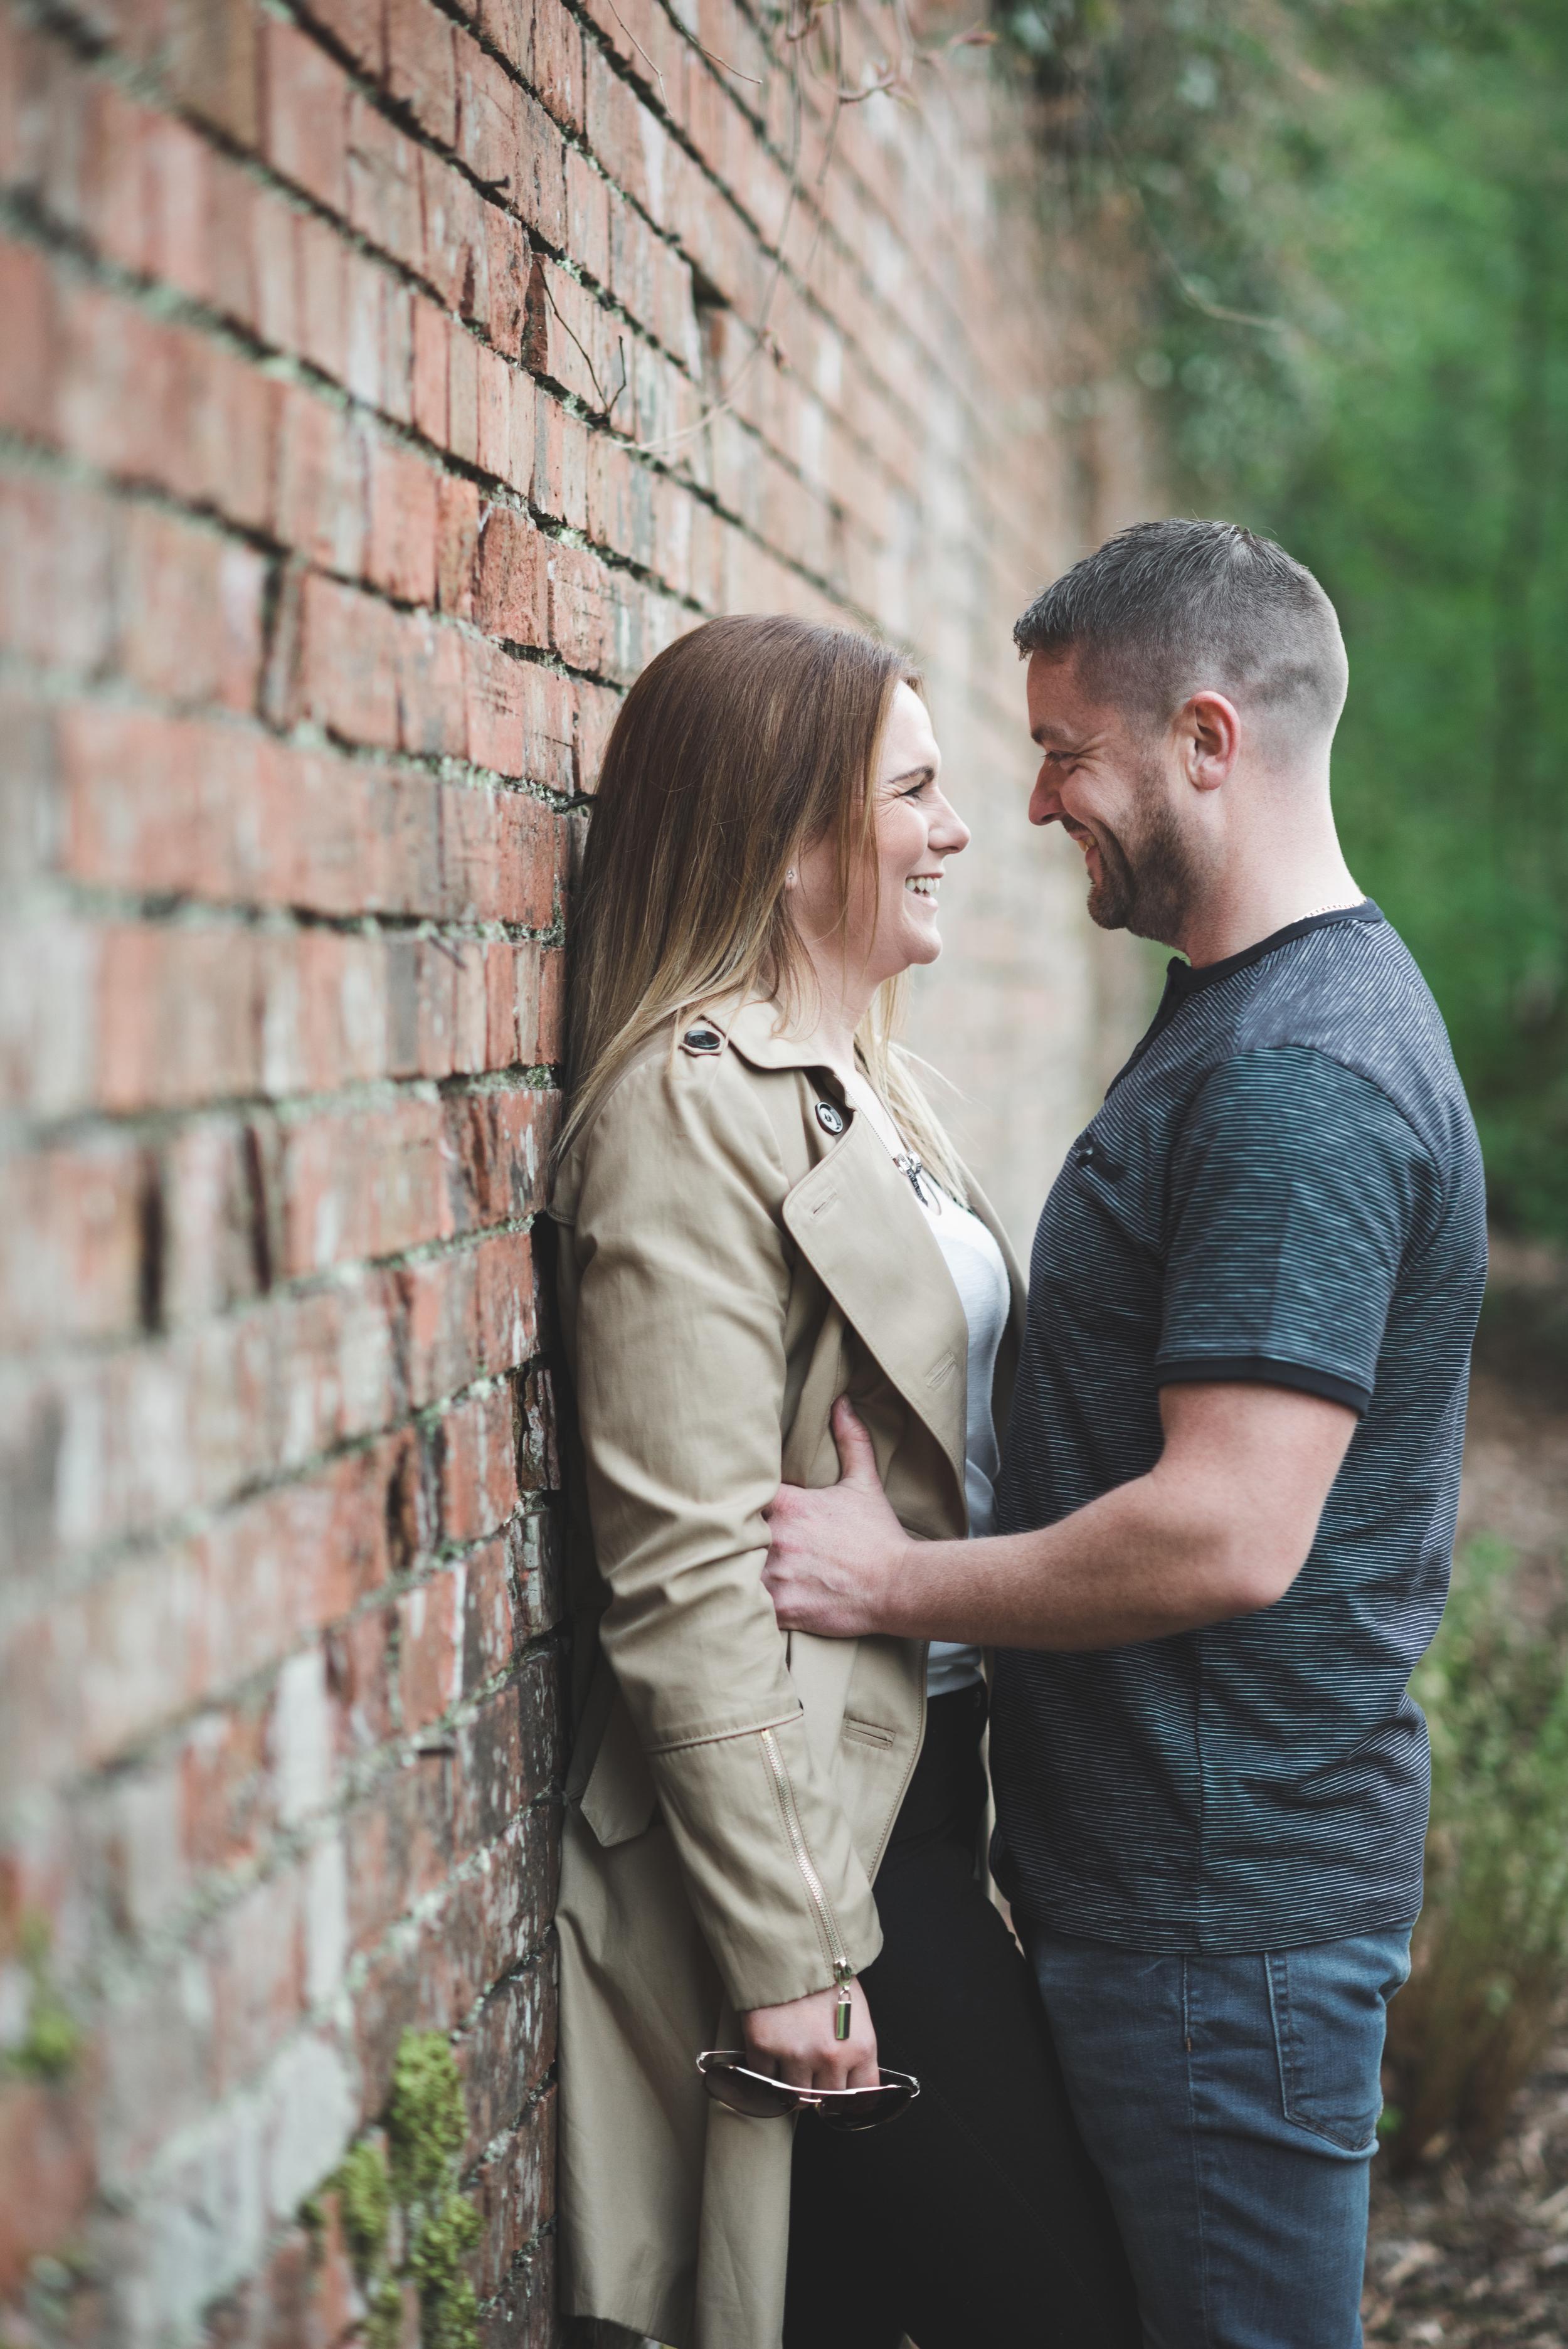 Nikki_Chris_engagement_session_belfast_purephotoni_sir_thomas_and_lady_dixons_park_brick_wall